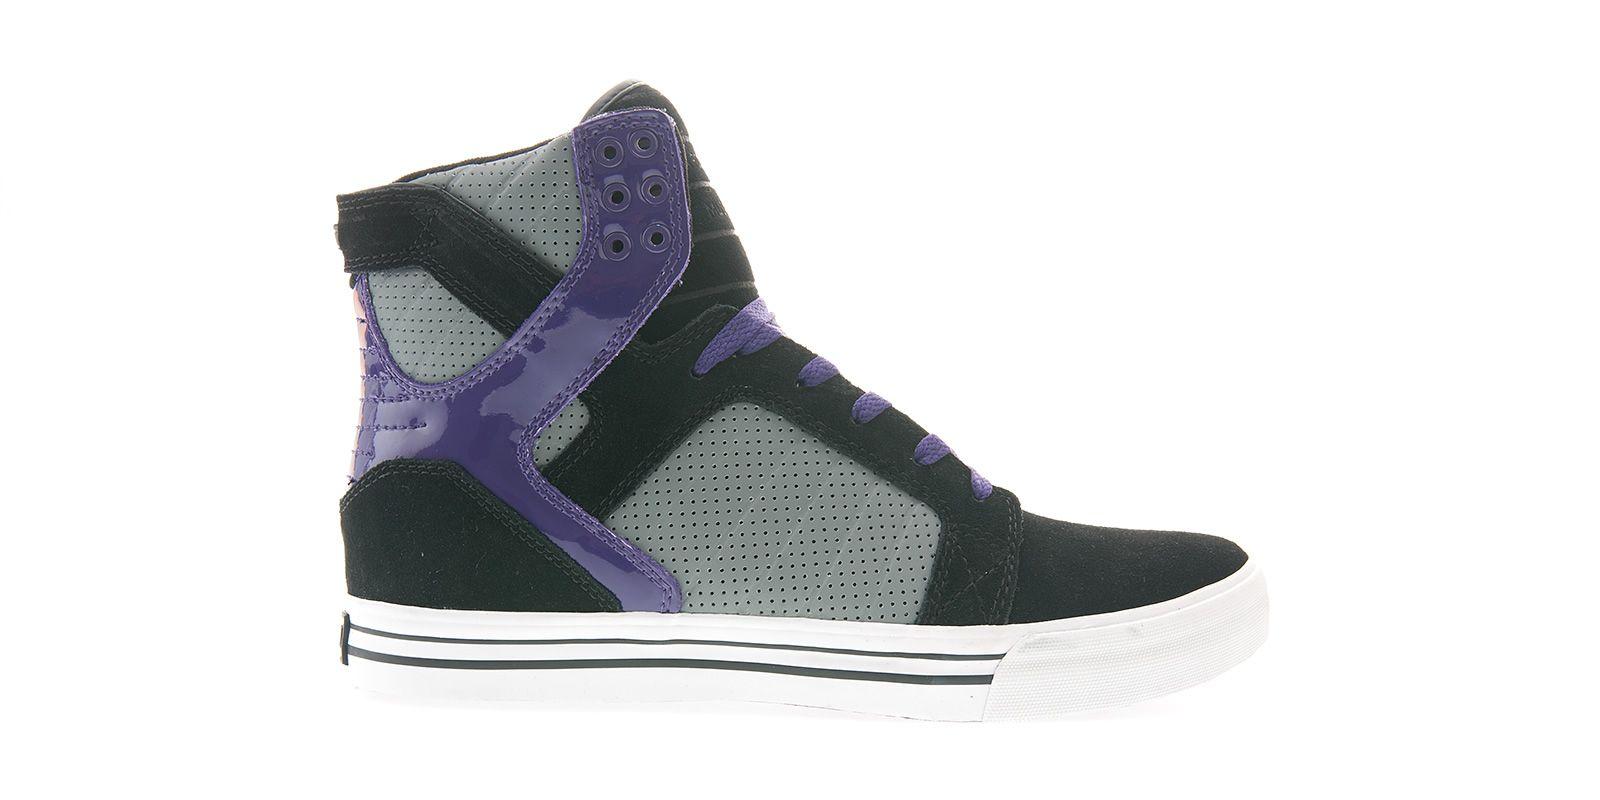 SUPRA MENS SKYTOP - Premier Sport #Supra #Sneakers #Trainers #Footwear #Skate #California